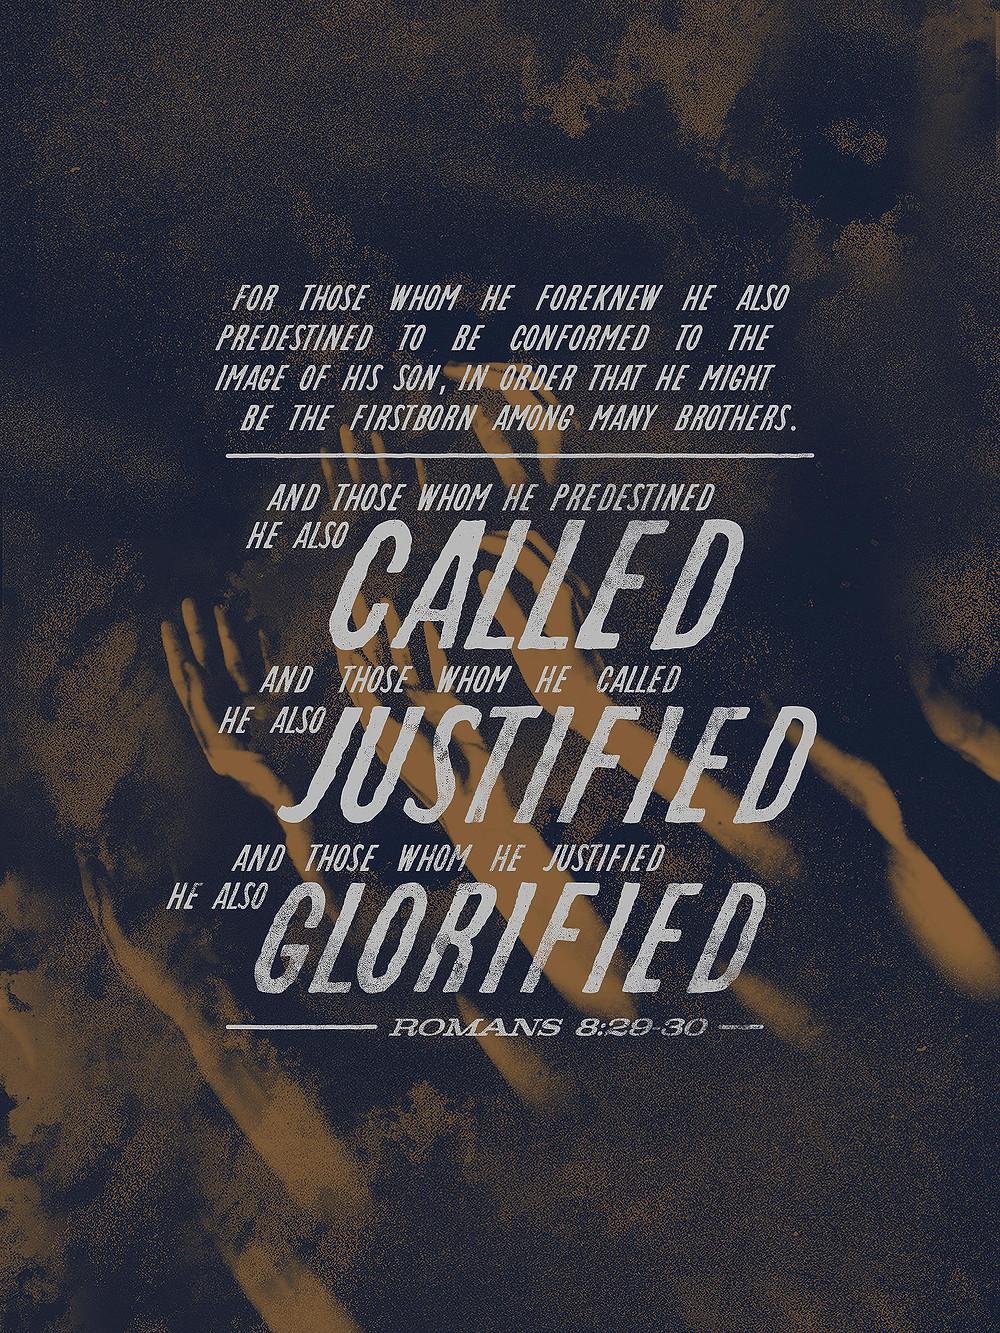 Desiring God: The War With Flesh and Spirit